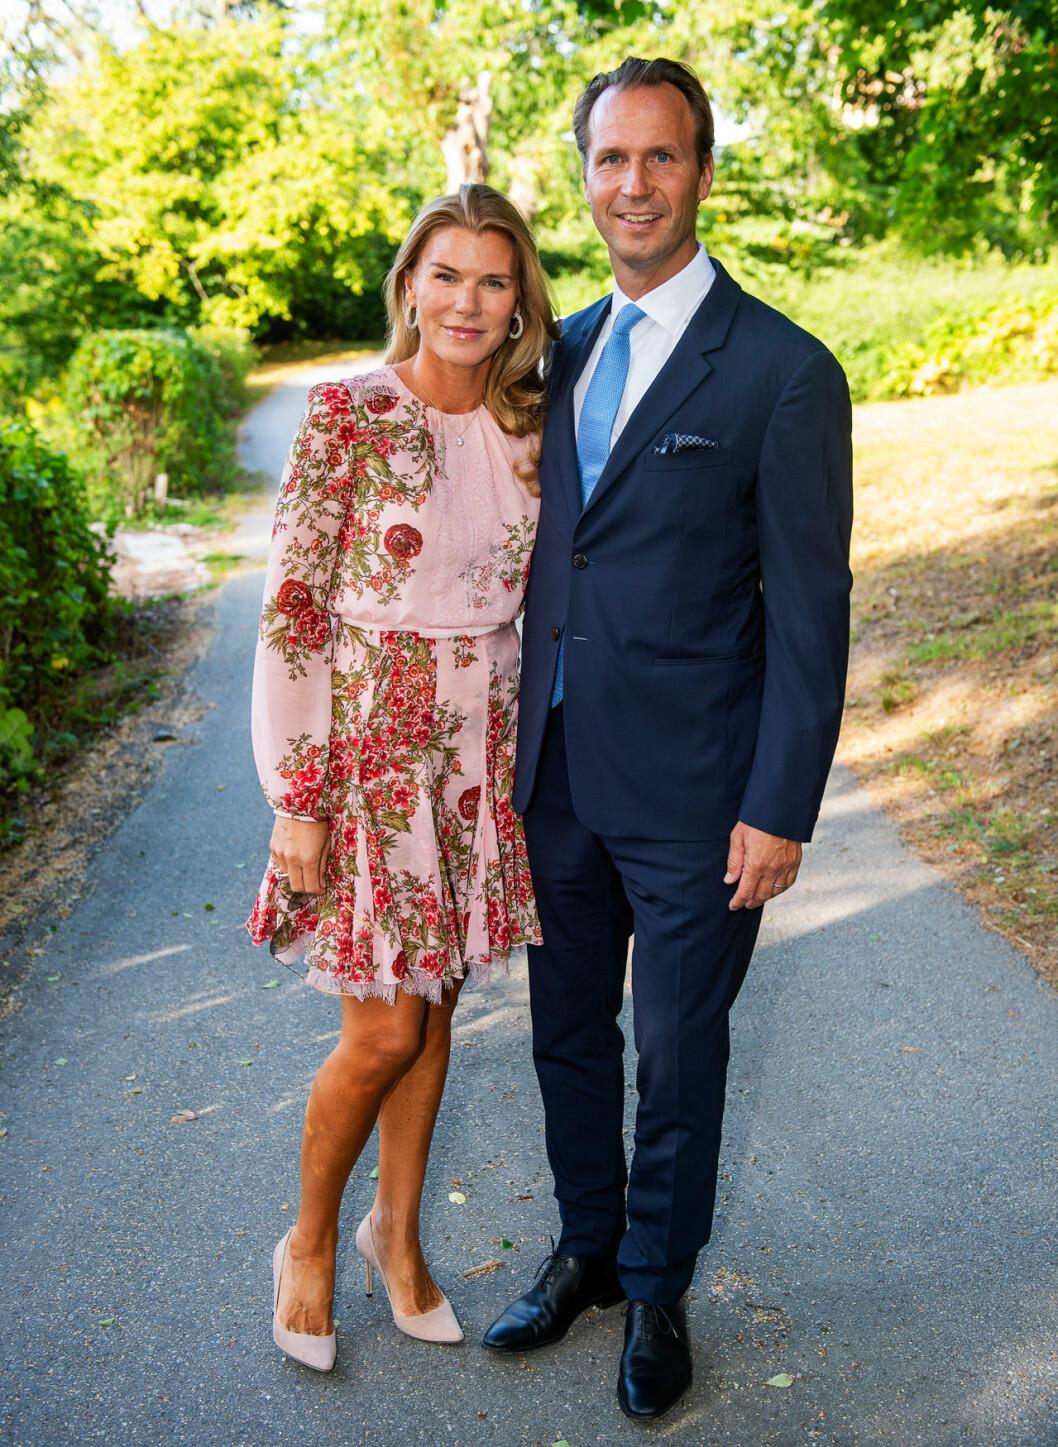 H&M-prinsessan Lina von Heidenstam med sin man Petter.